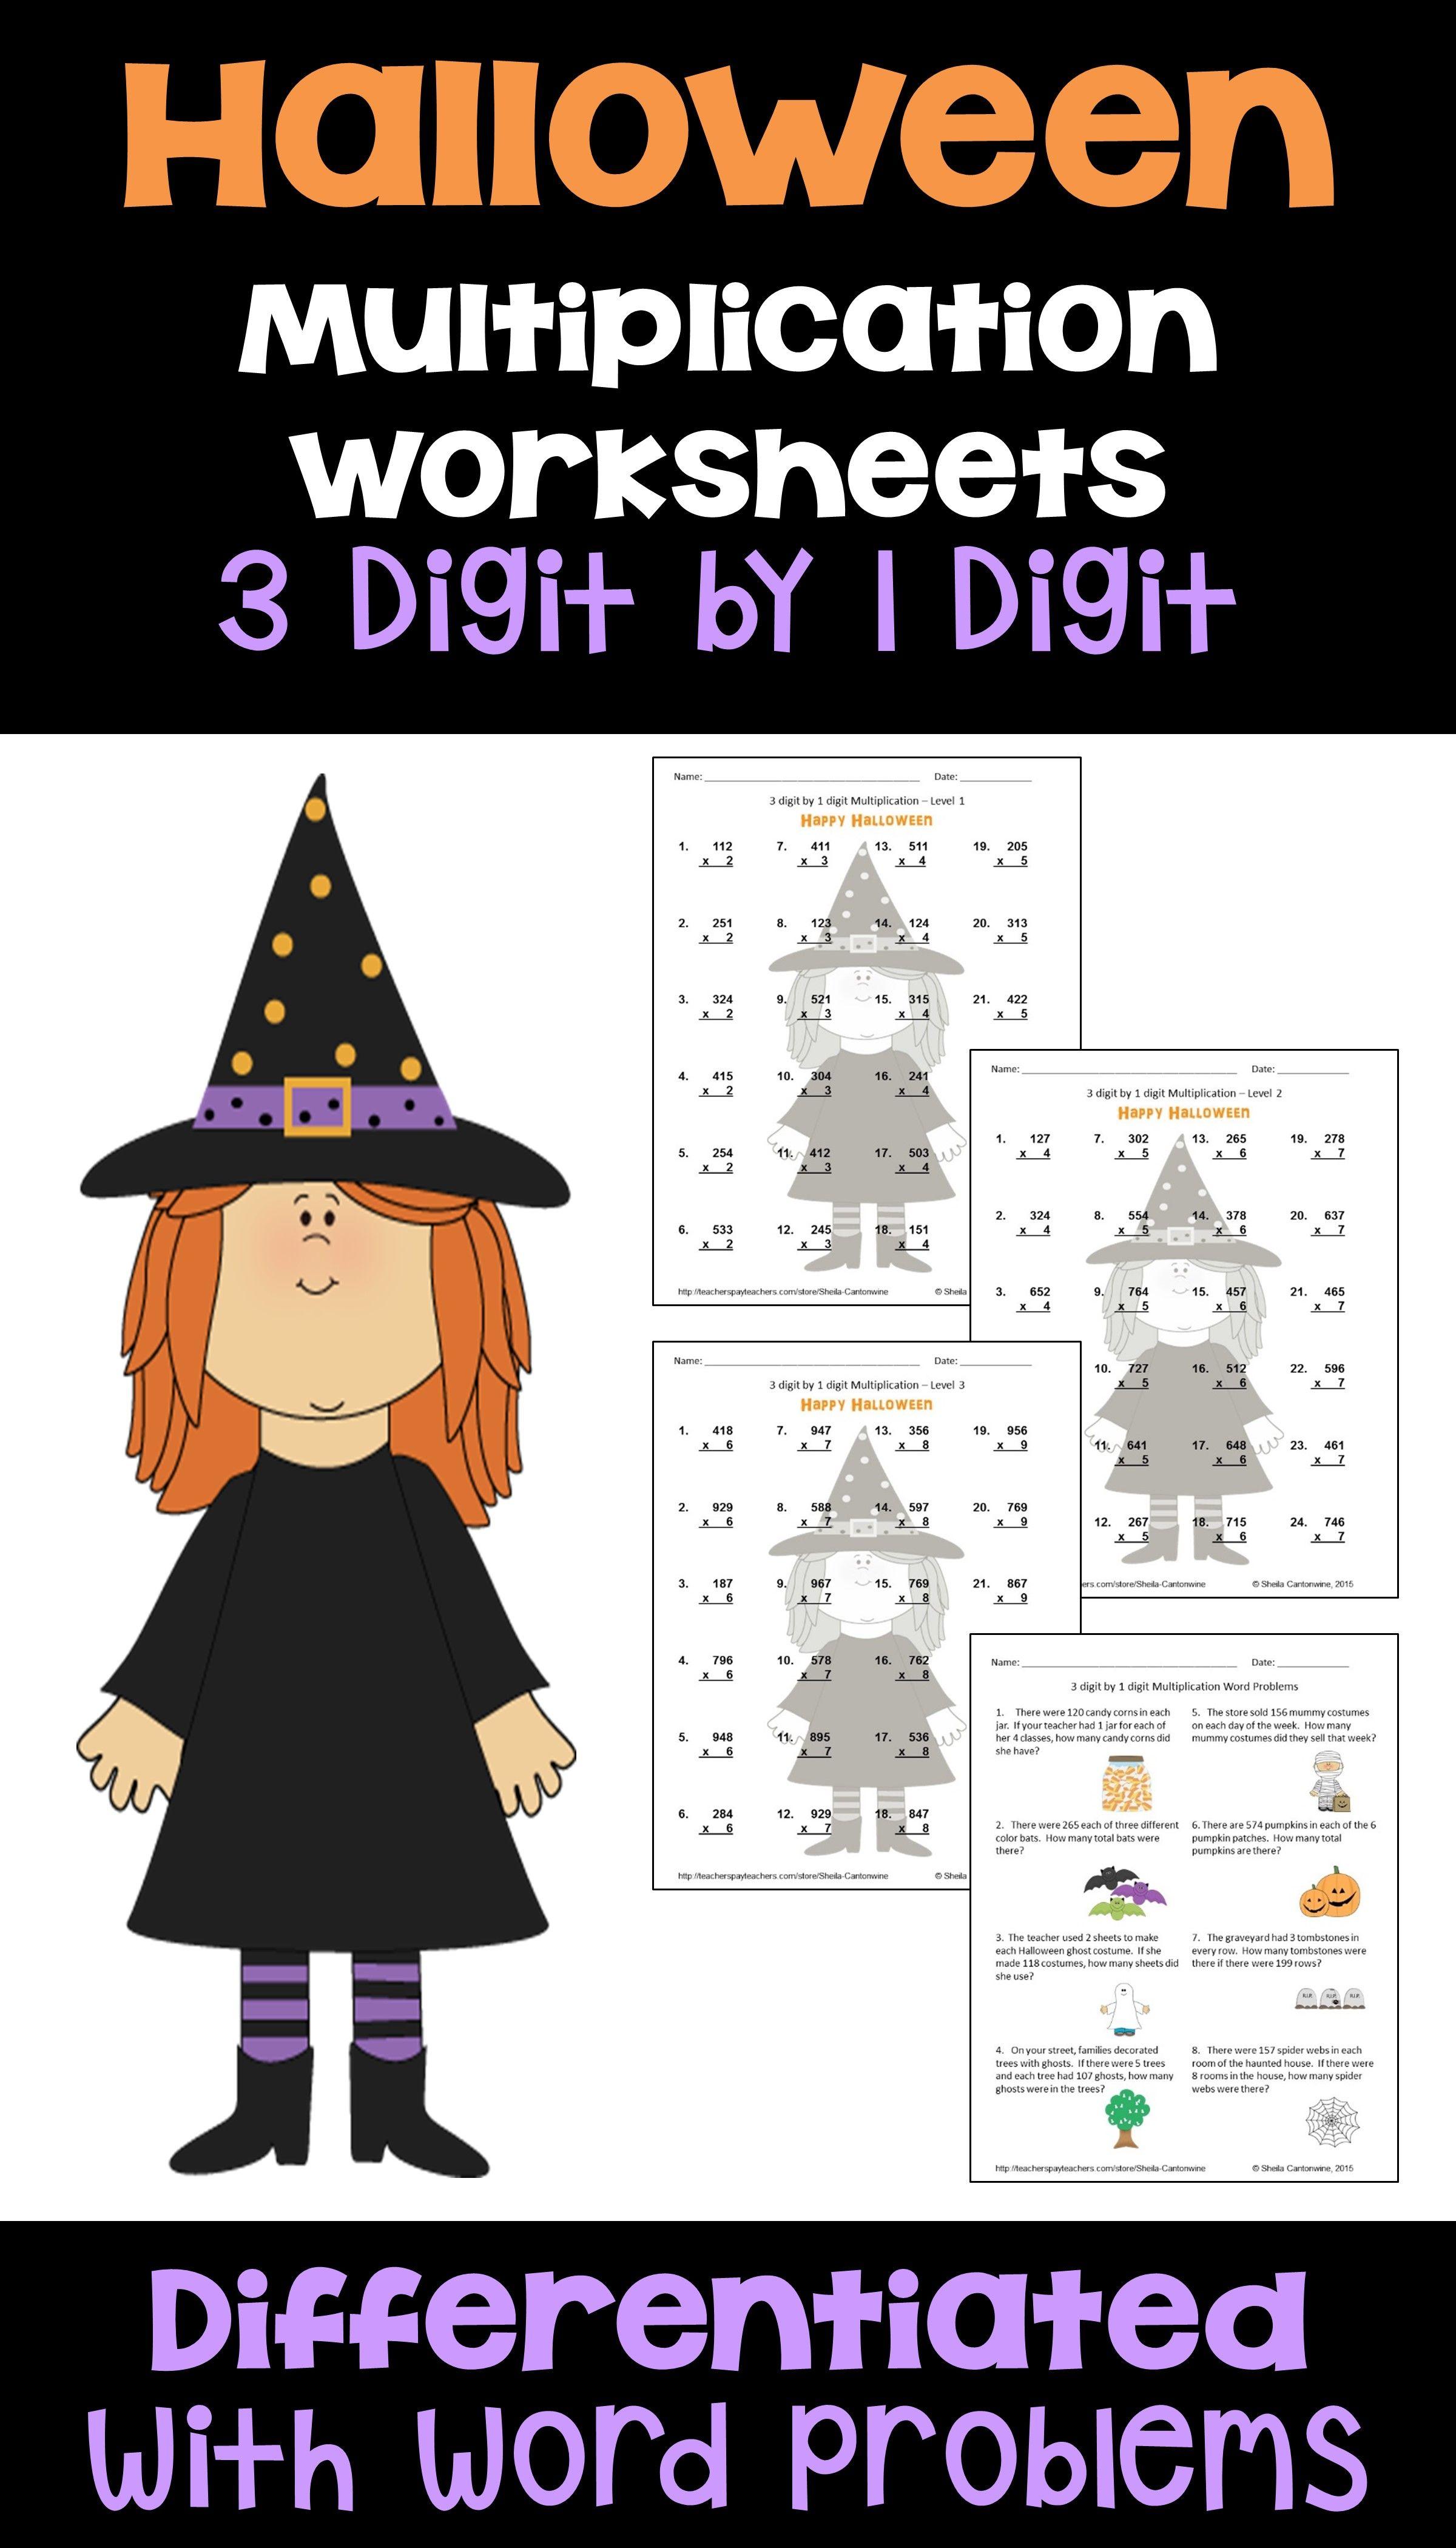 Halloween Math 3 Digit By 1 Digit Multiplication Worksheets